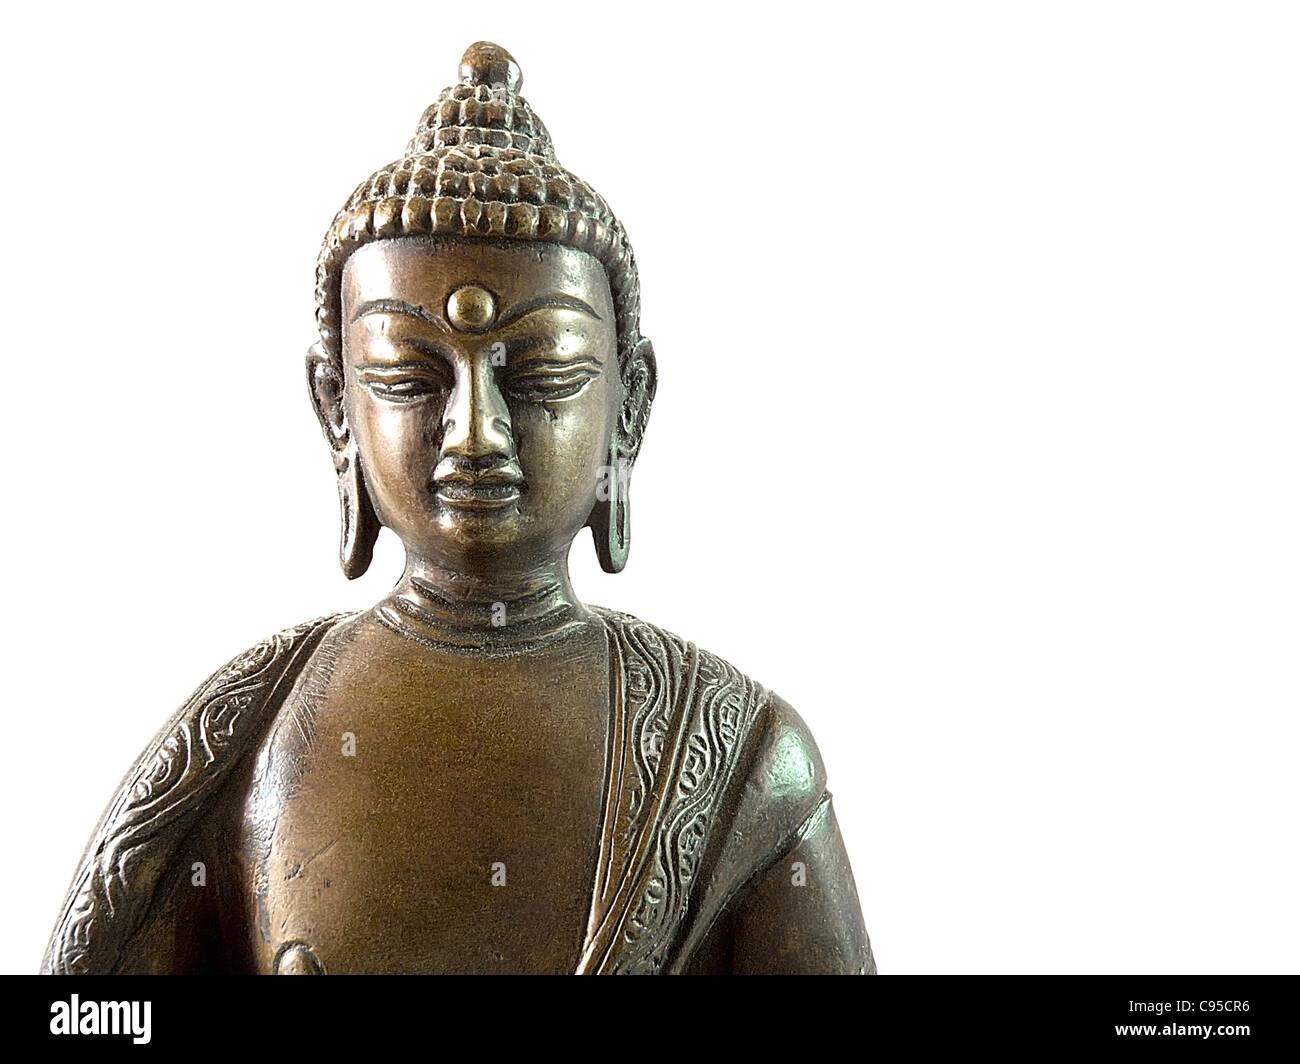 Nepalese hand-made antique statue of Buddha Amithaba. - Stock Image